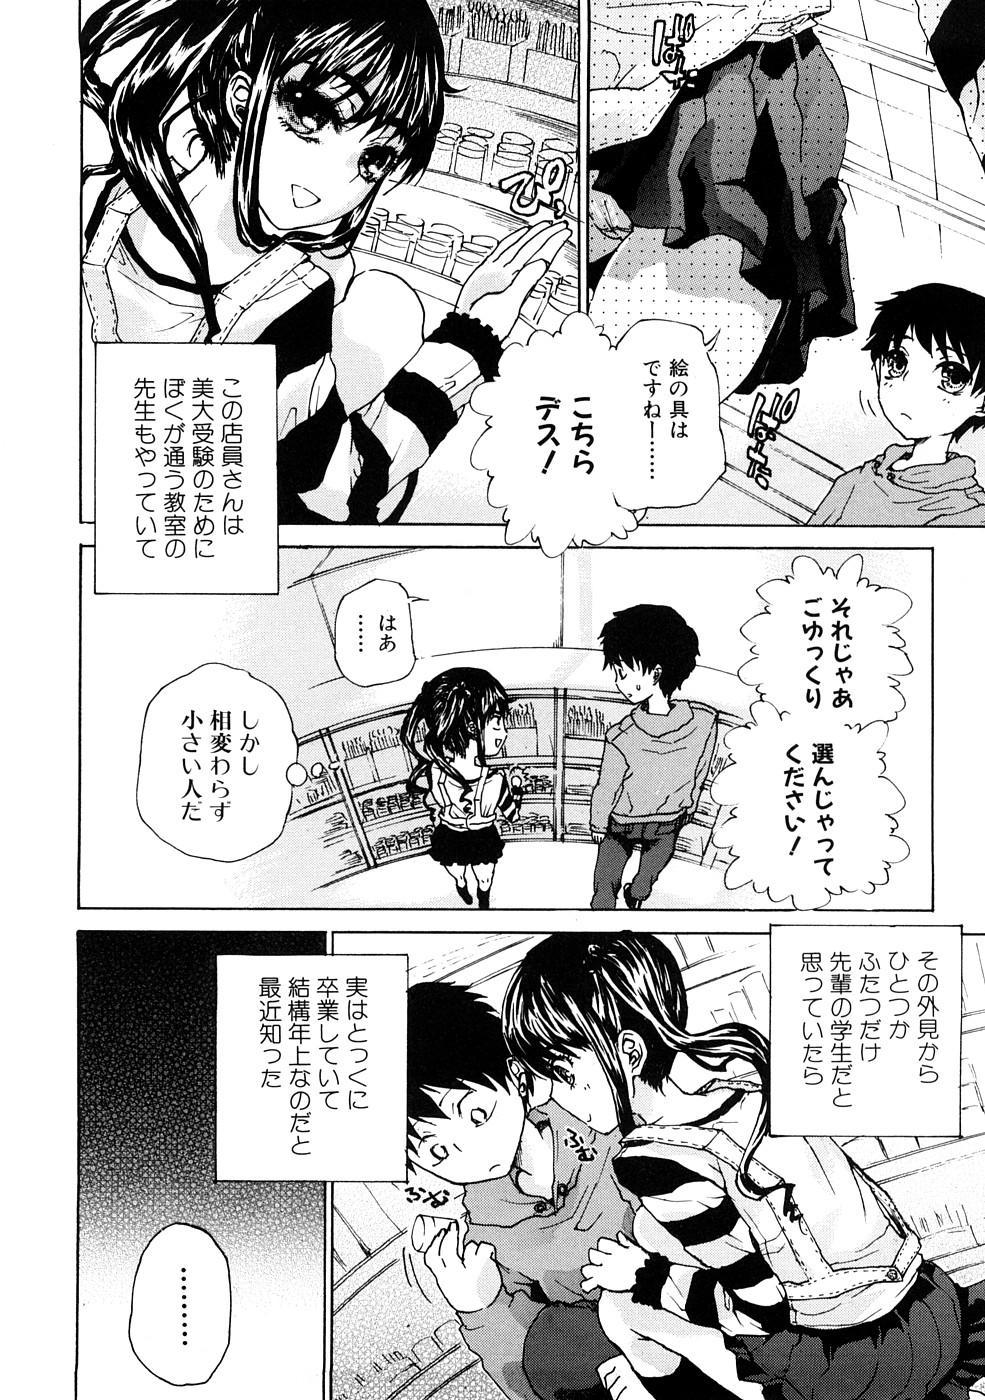 Ecchi de Jibunkatte de Kawaii Ko 83